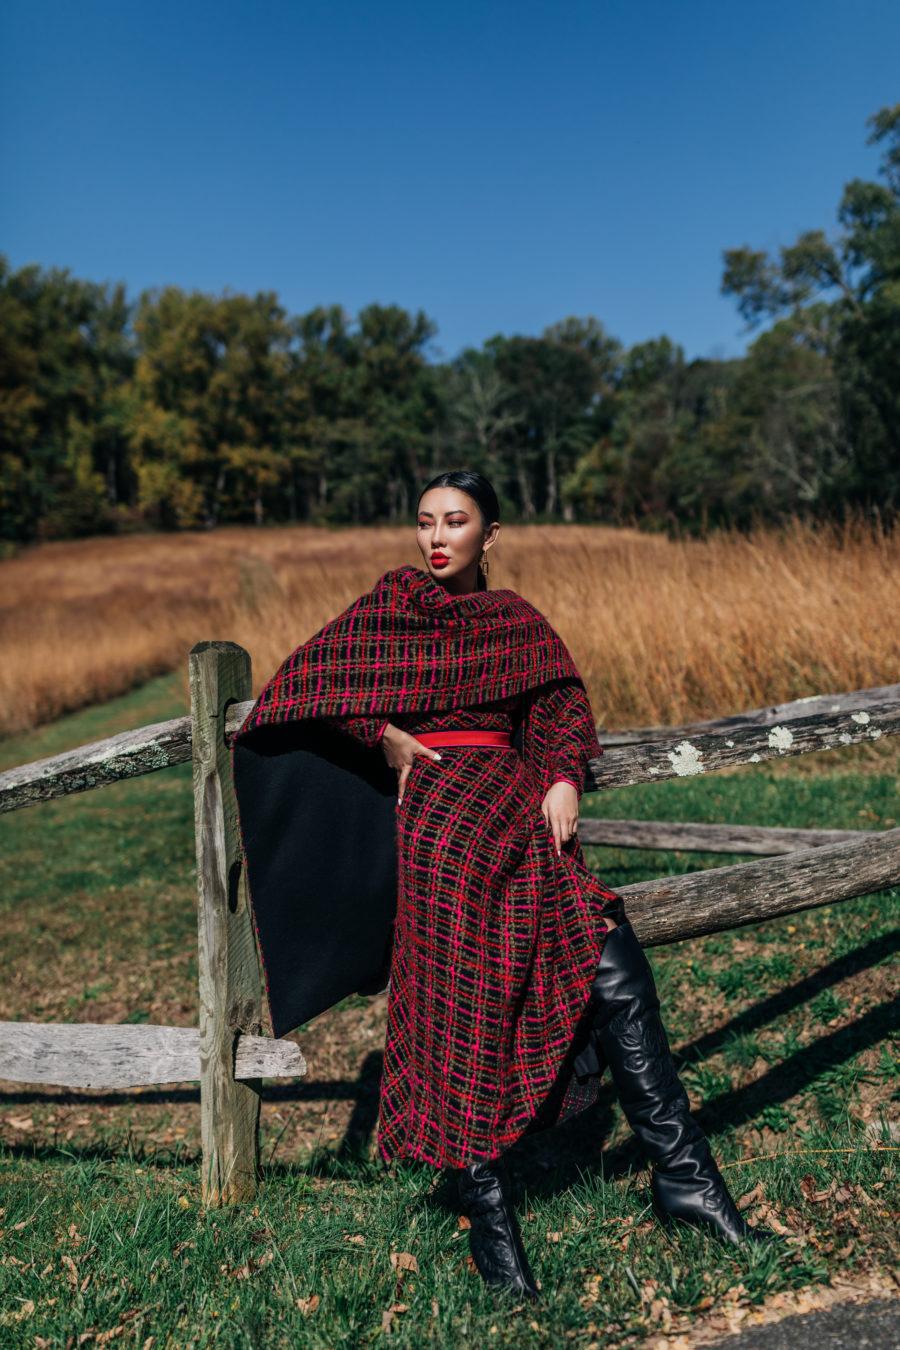 jessica wang editorial photography cover shoot for legend magazine // Jessica Wang - Notjessfashion.com